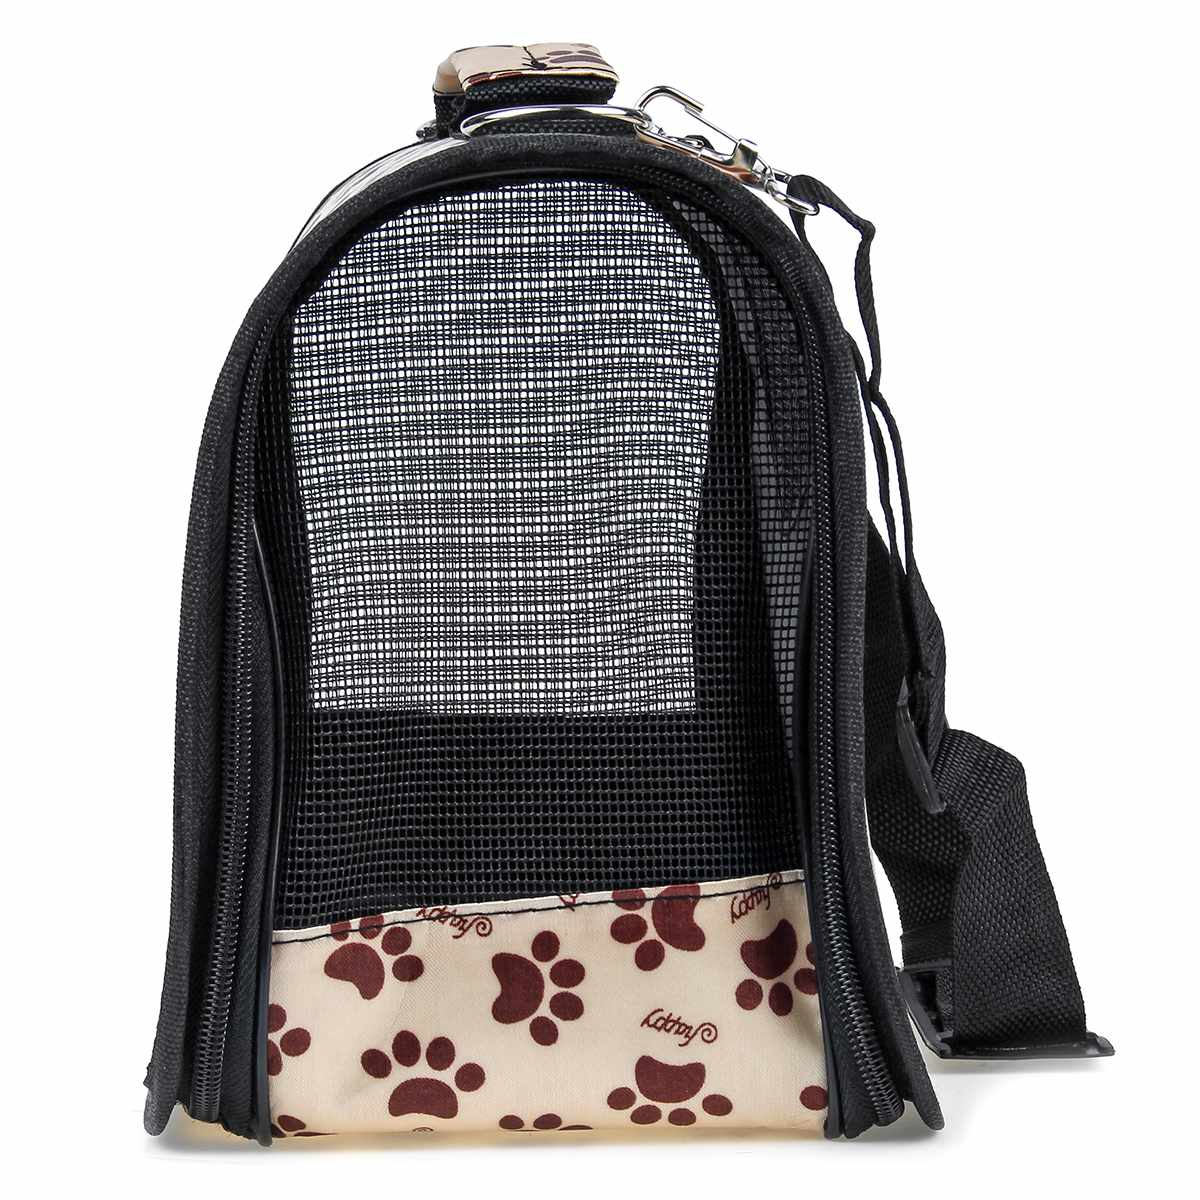 1Pc Comfortable Folding Pet Carrier Bag